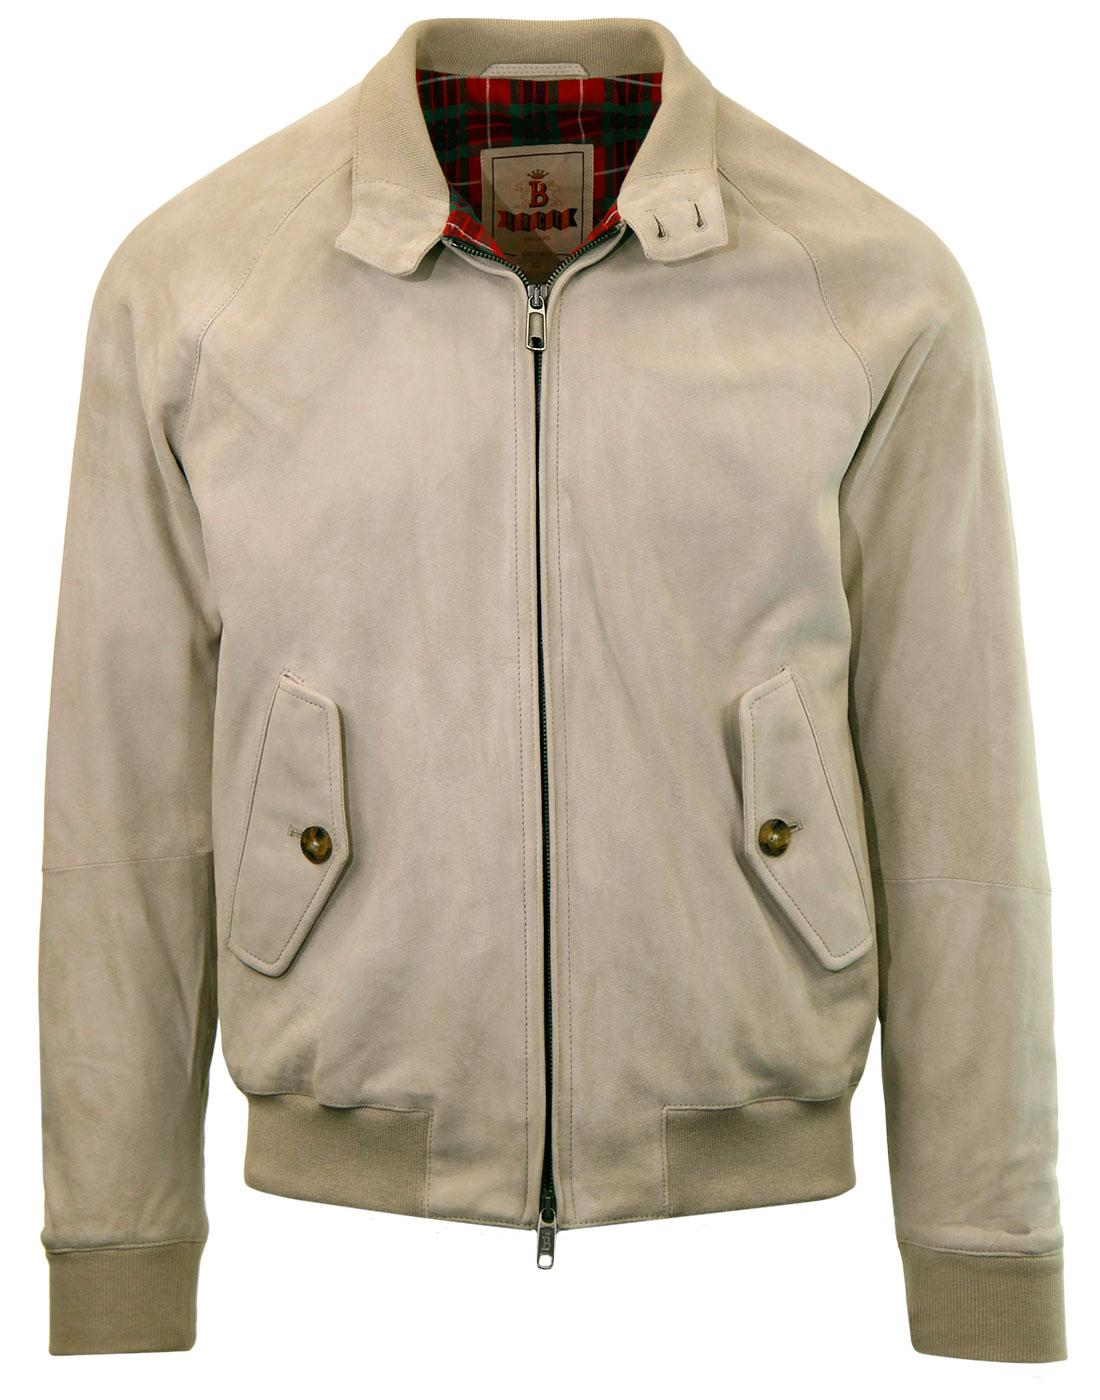 BARACUTA G9 Suede Mod Harrington Jacket STONE